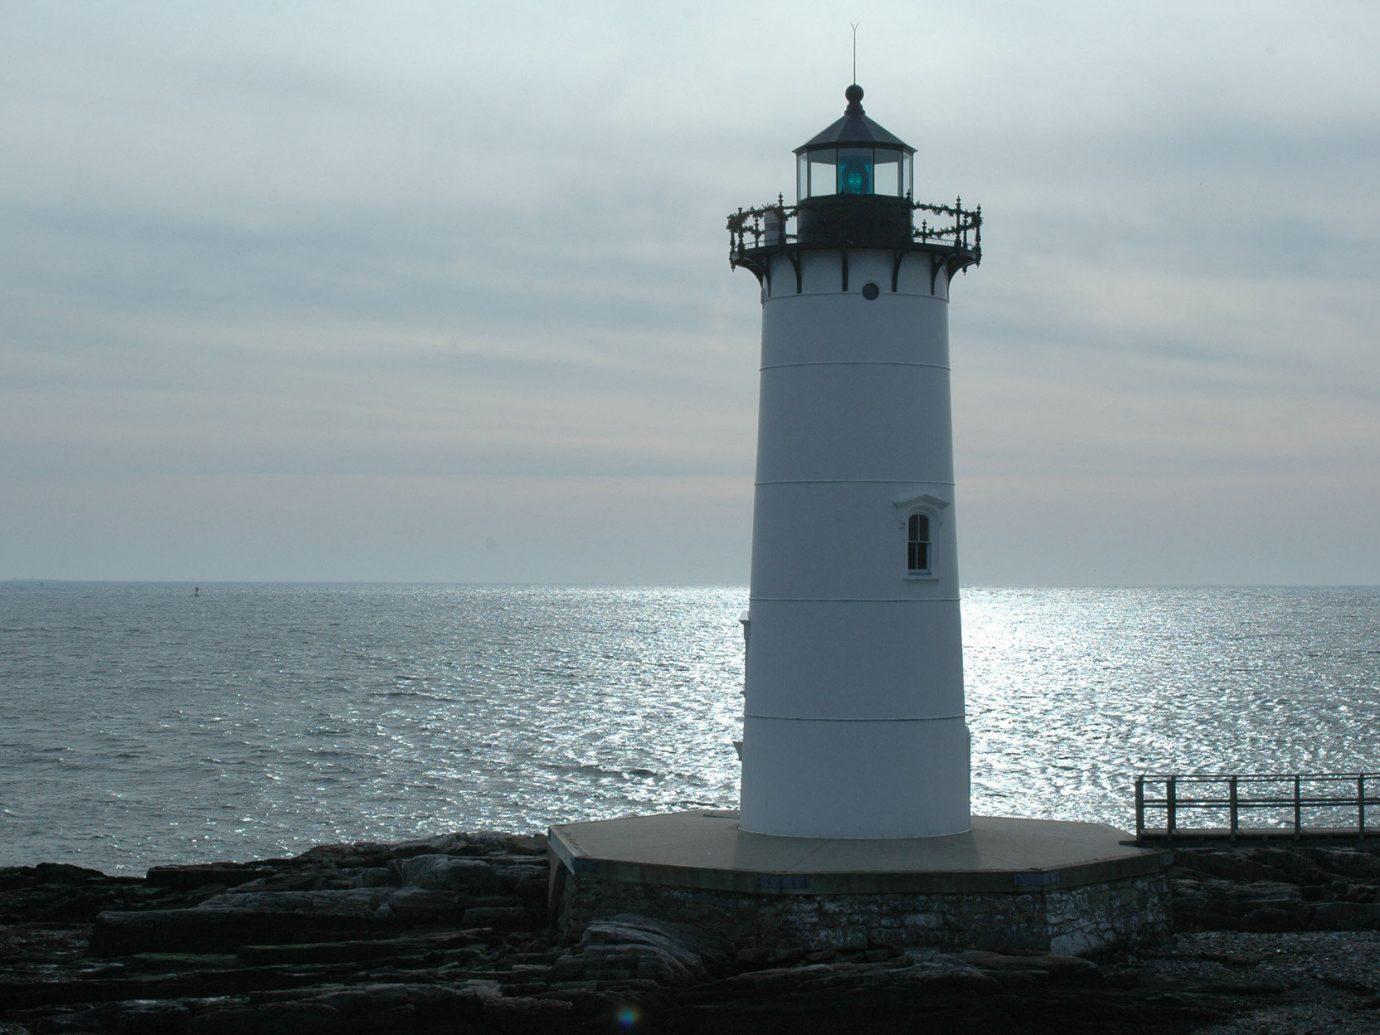 Trip Ideas water sky outdoor lighthouse tower Sea Ocean Coast cape overlooking